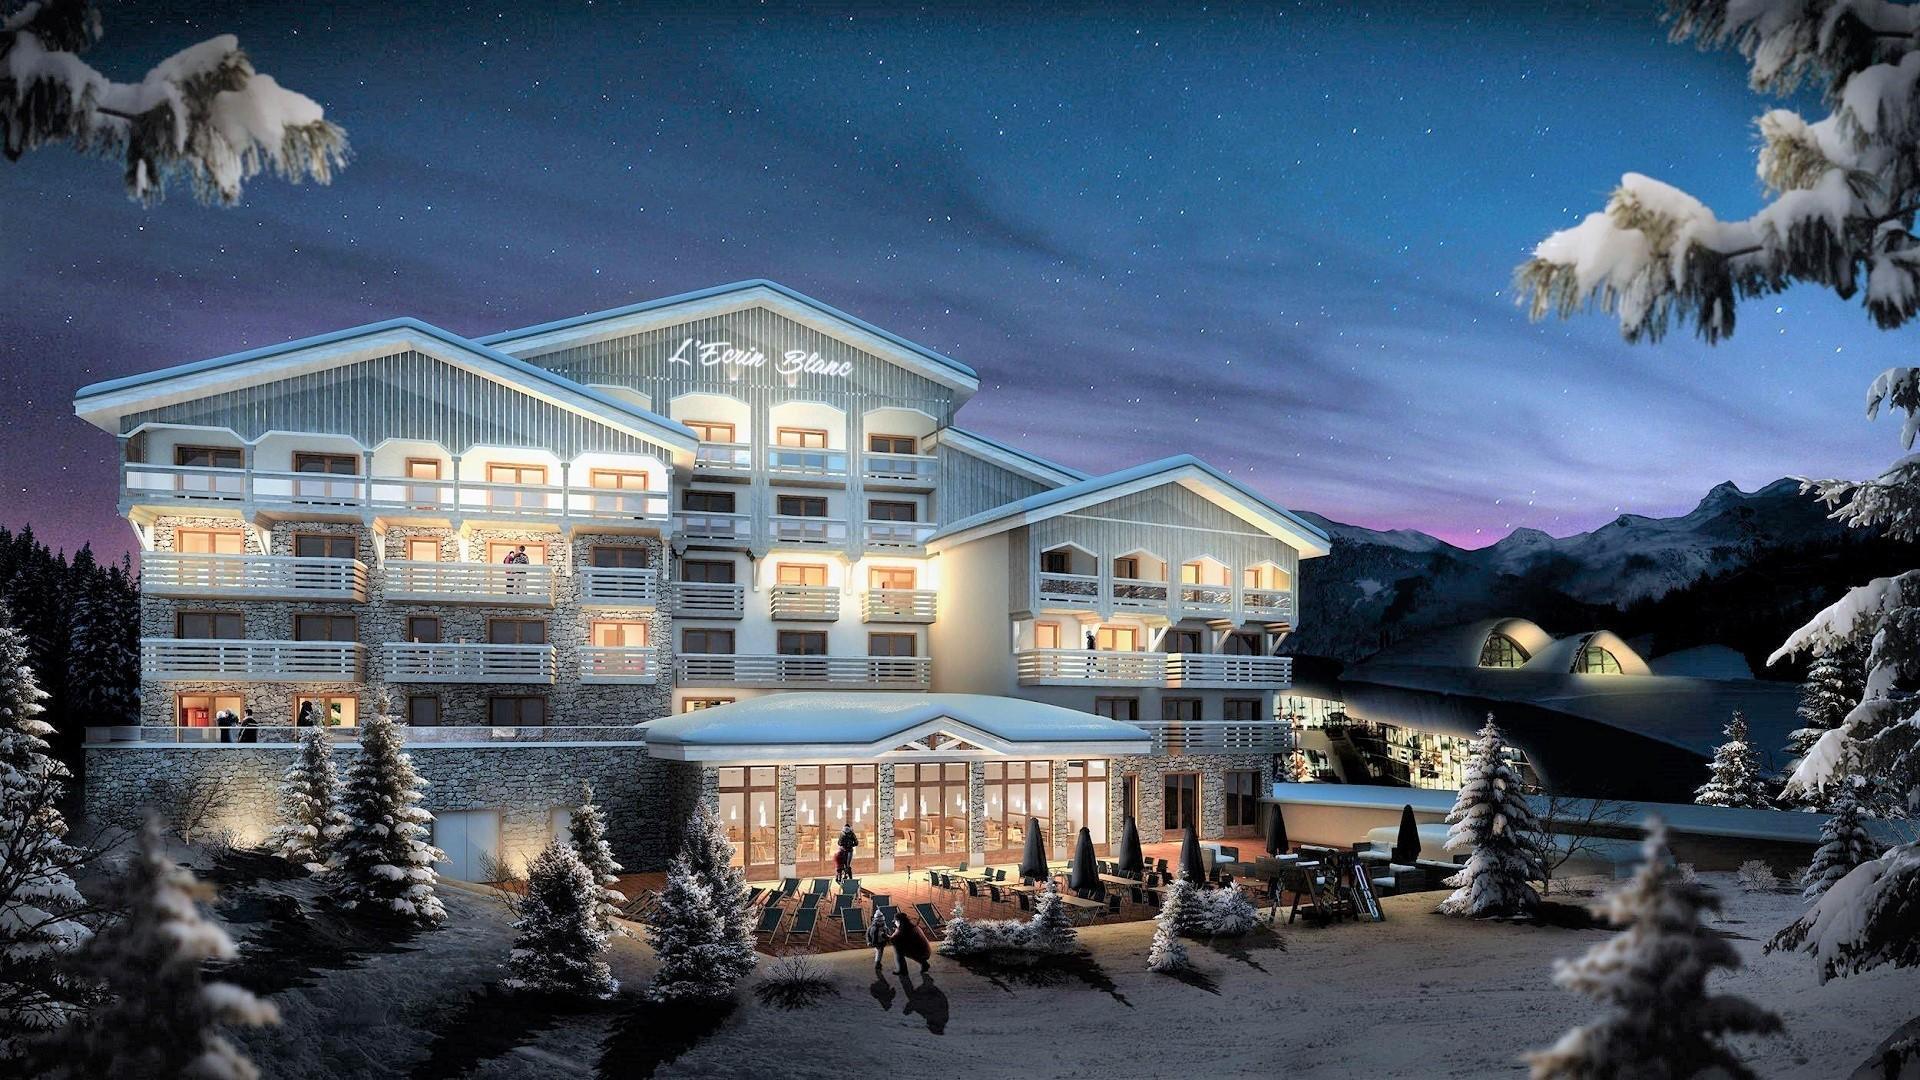 ecrin-blanc-courchevel-incentive-neige-ski-montagne-by-night